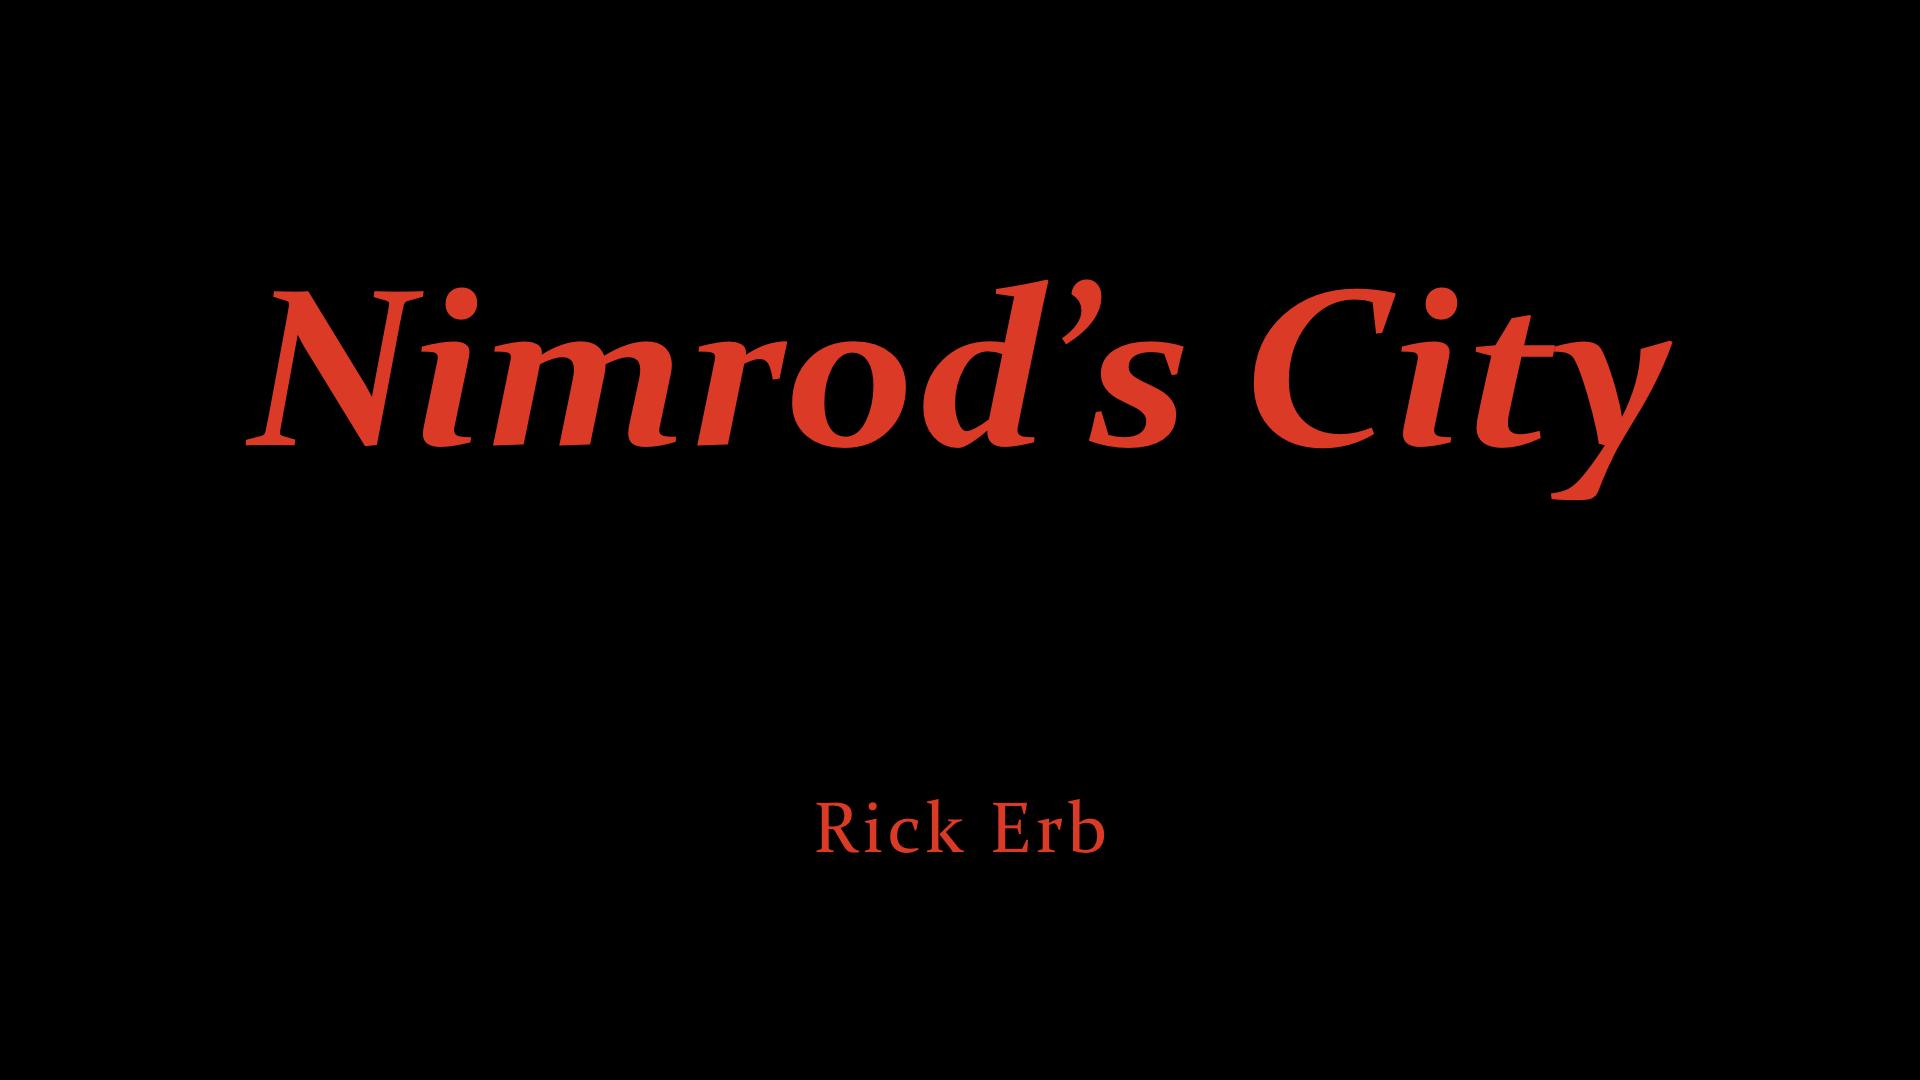 Rick Erb - Nimrod's City.jpeg